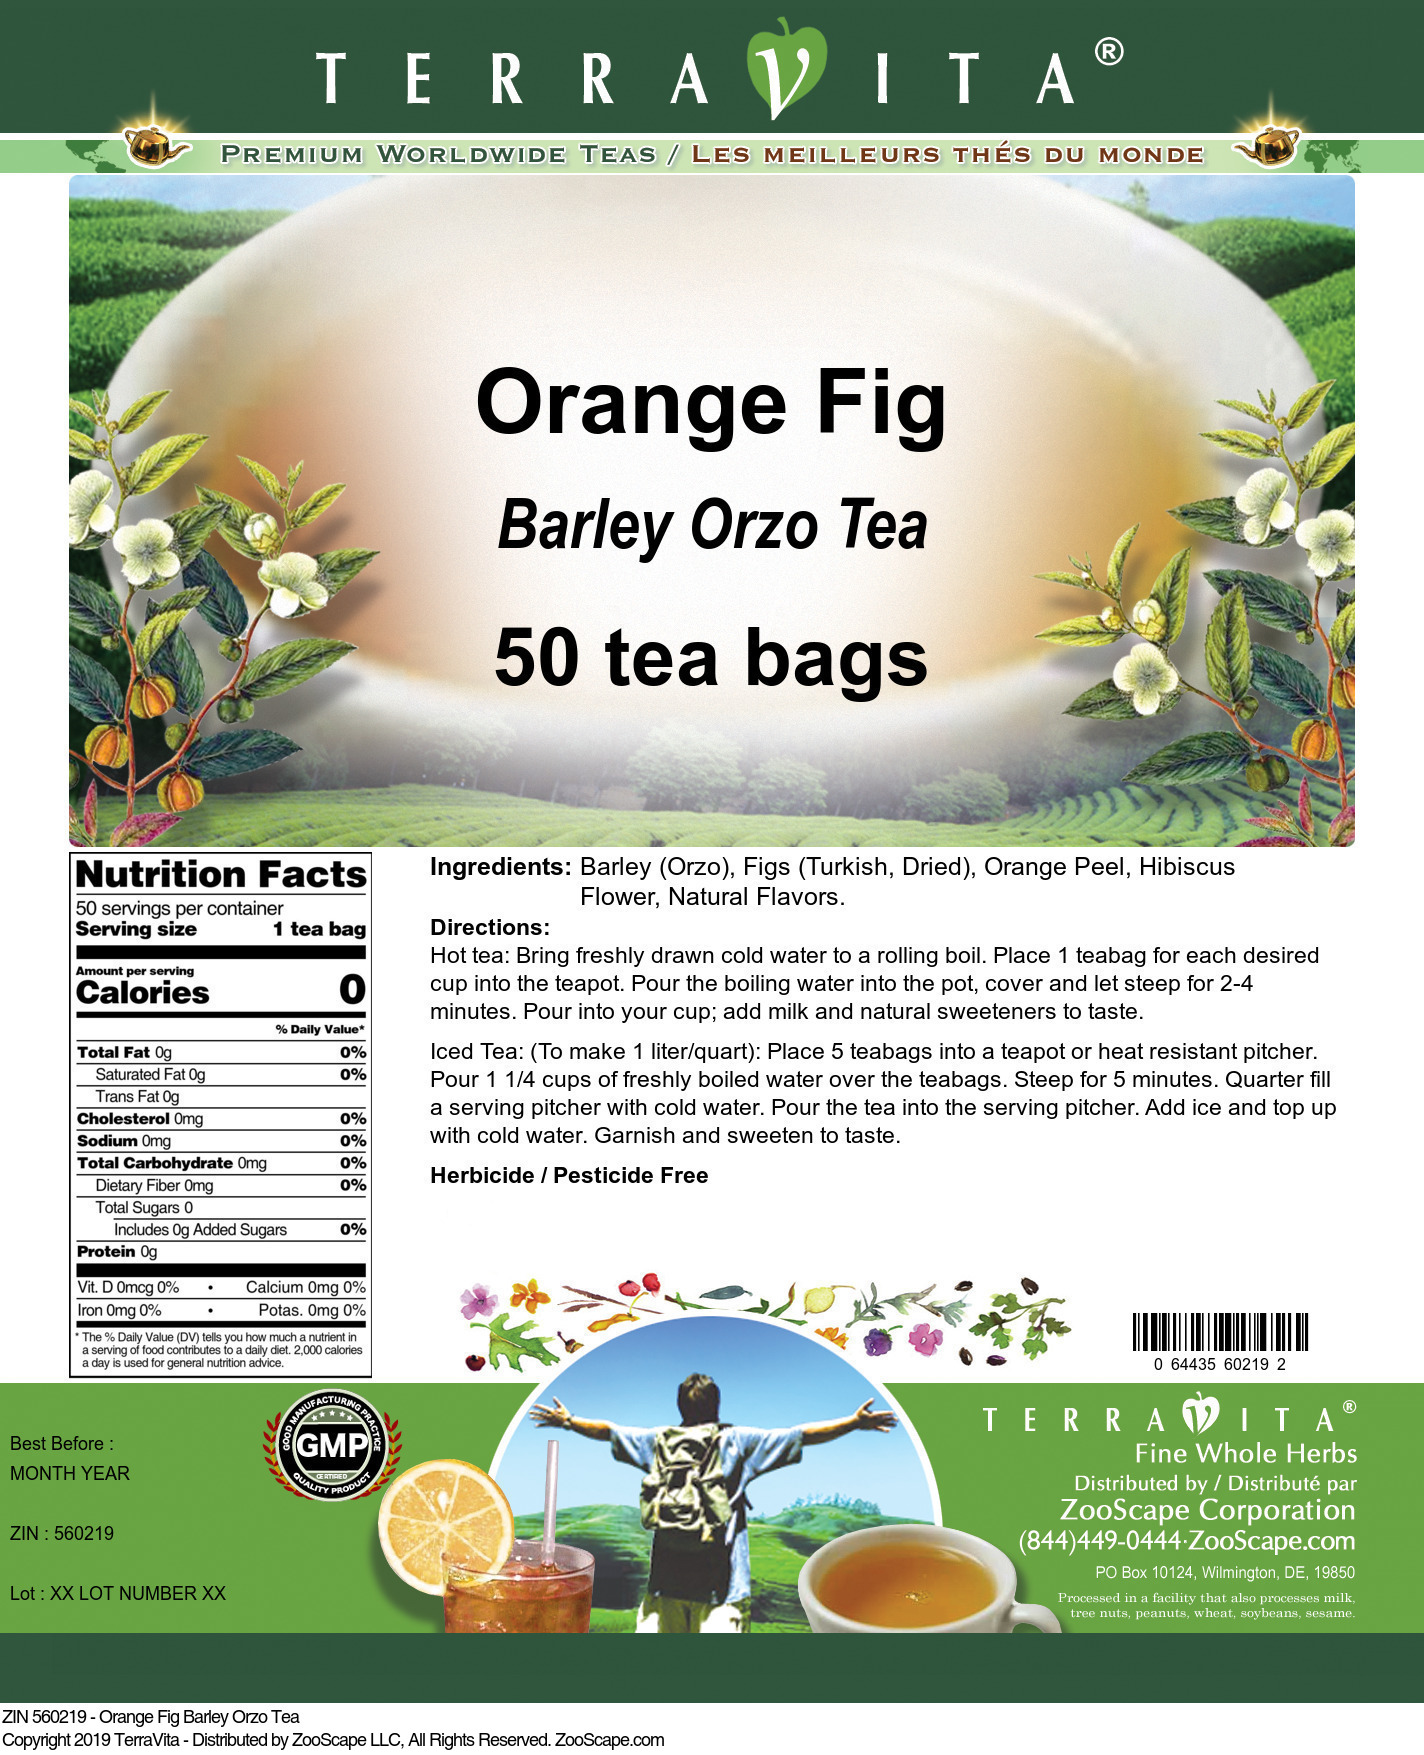 Orange Fig Barley Orzo